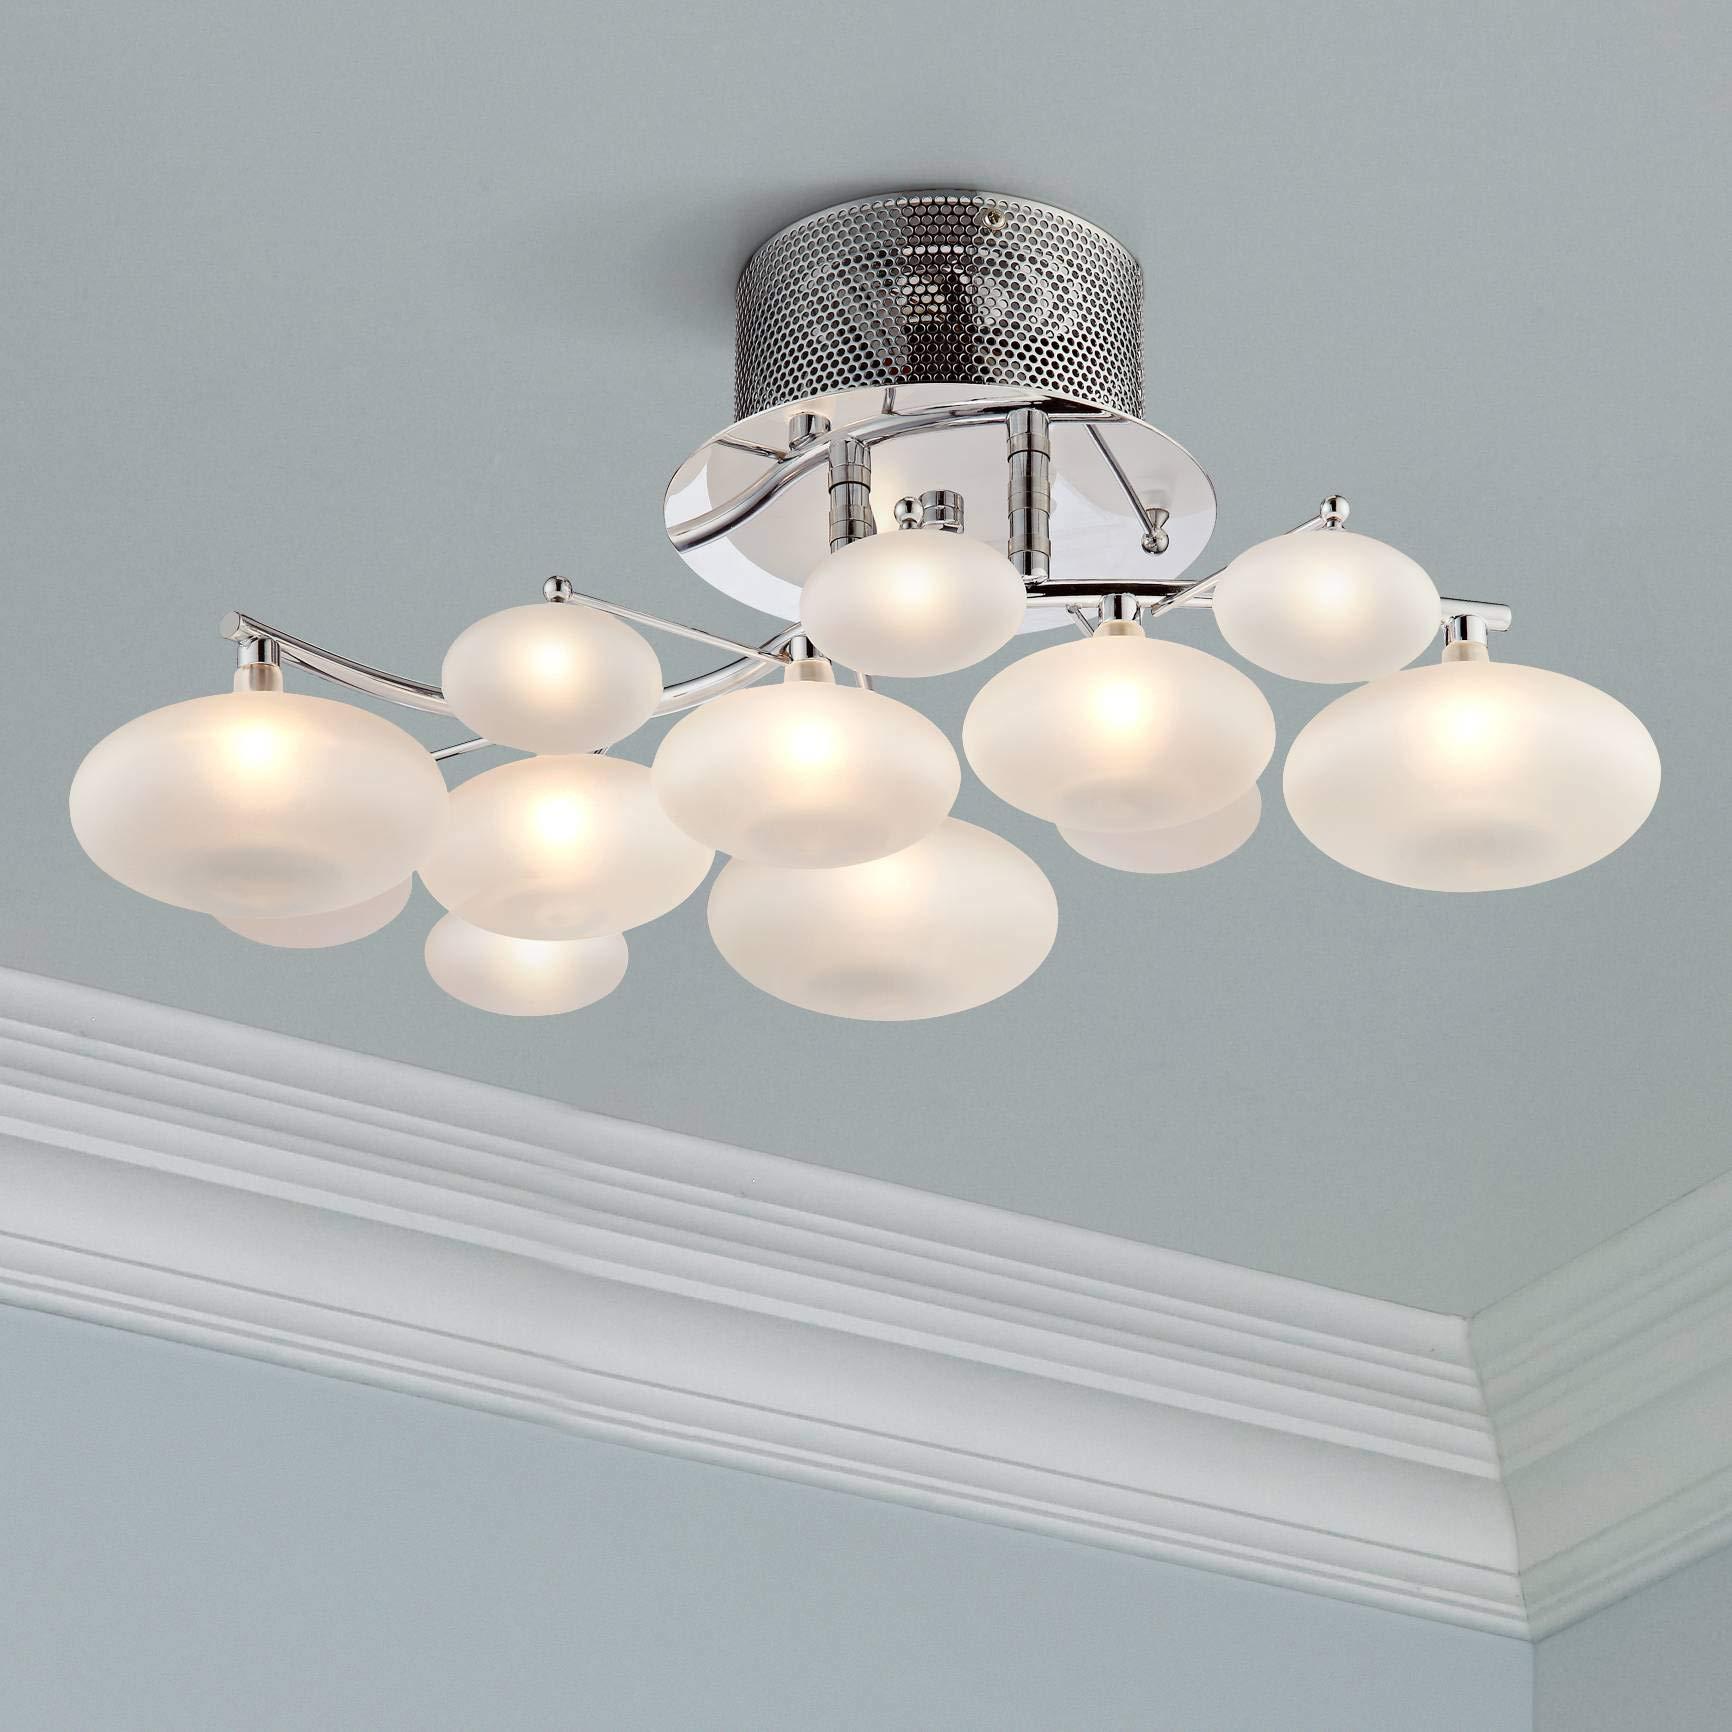 Possini Euro Lilypad 19 1/4'' Wide Etched Glass Ceiling Light - Possini Euro Design